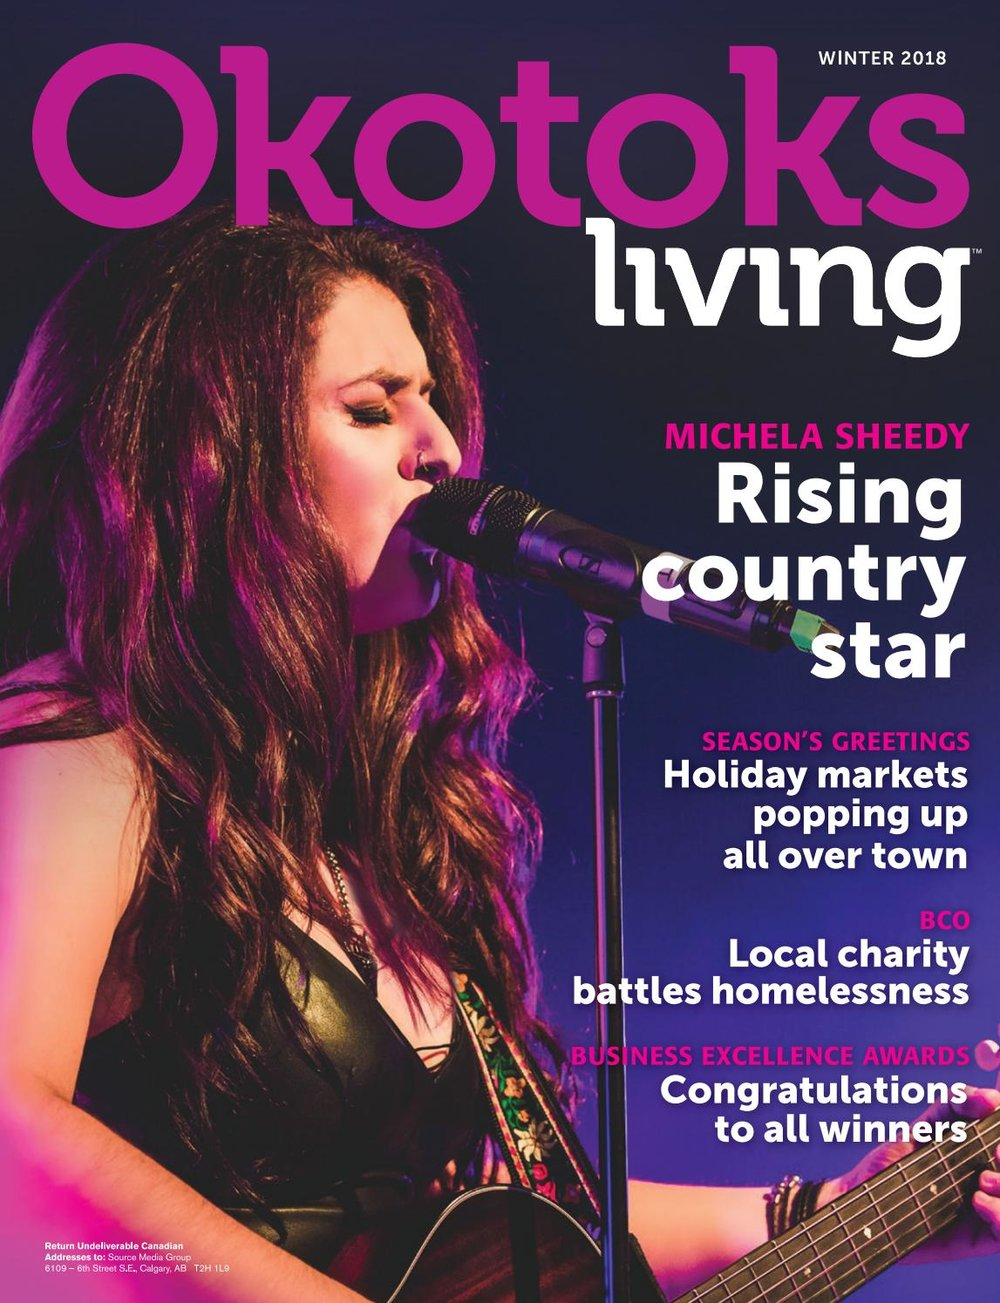 Okotoks Living - Winter 2018 Issue